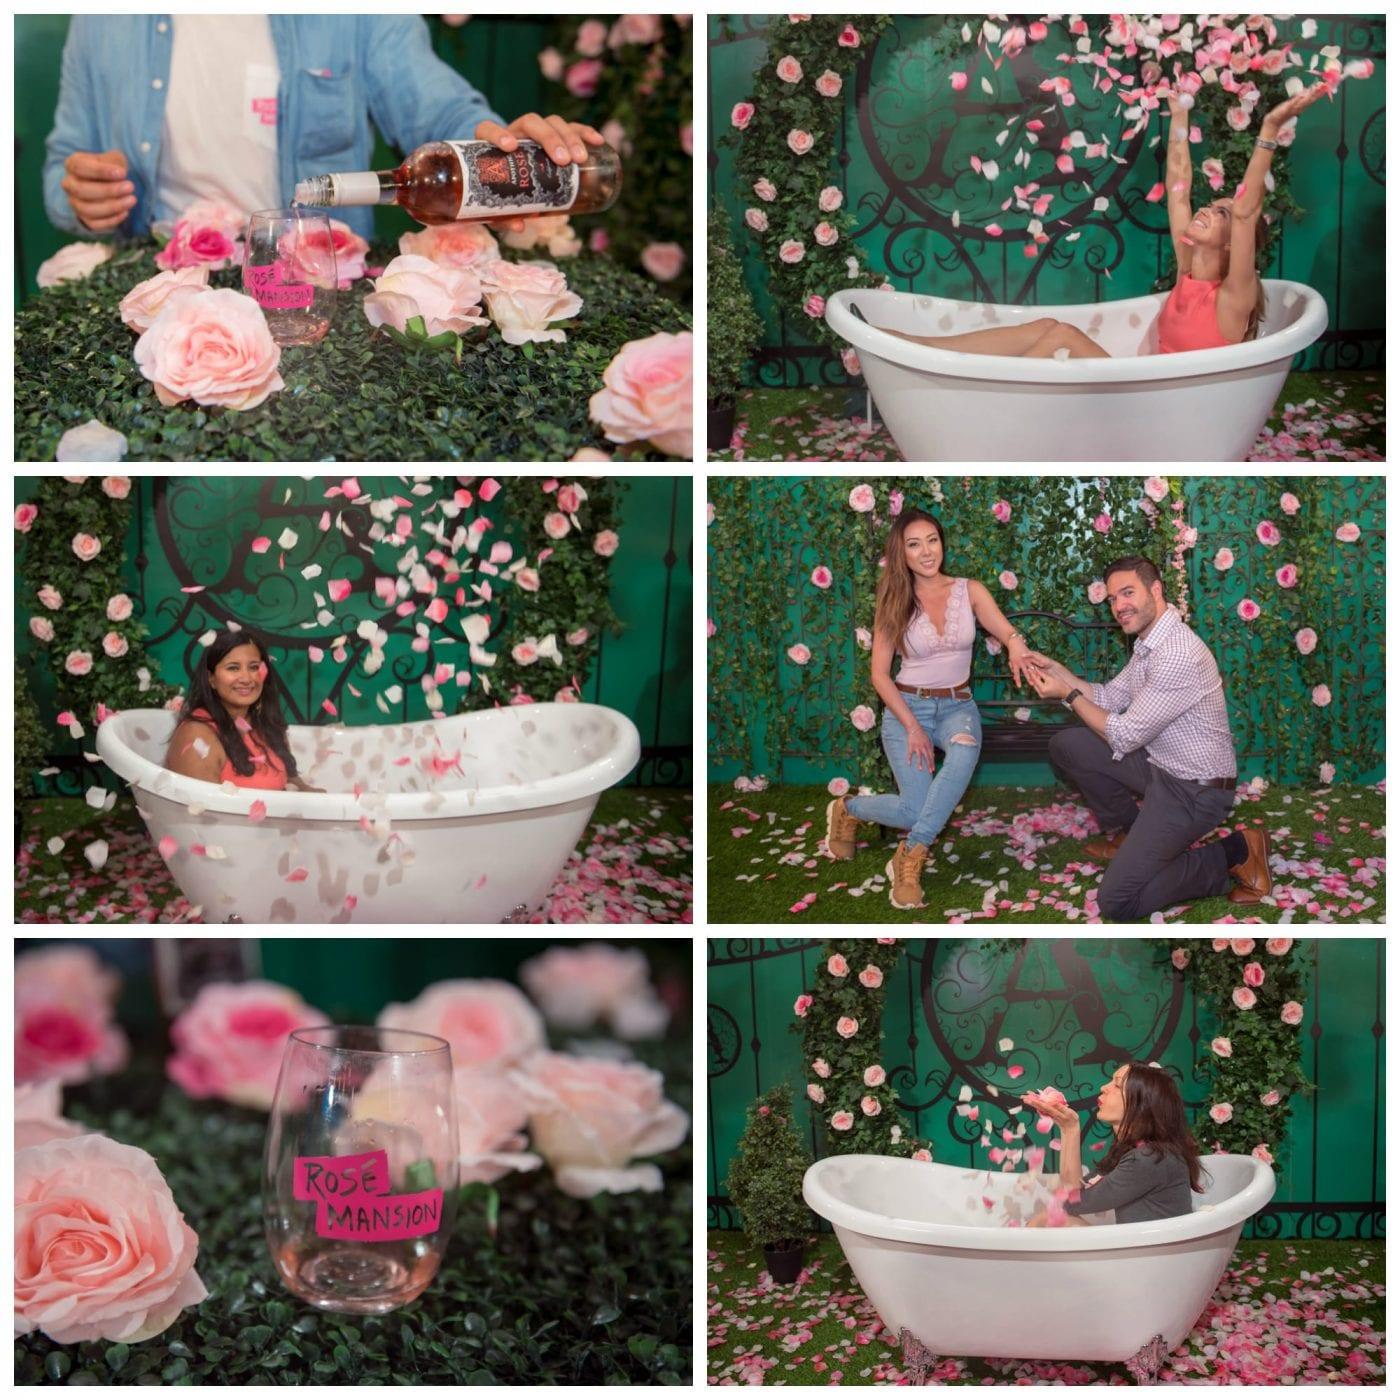 Rose Mansion Bathtub